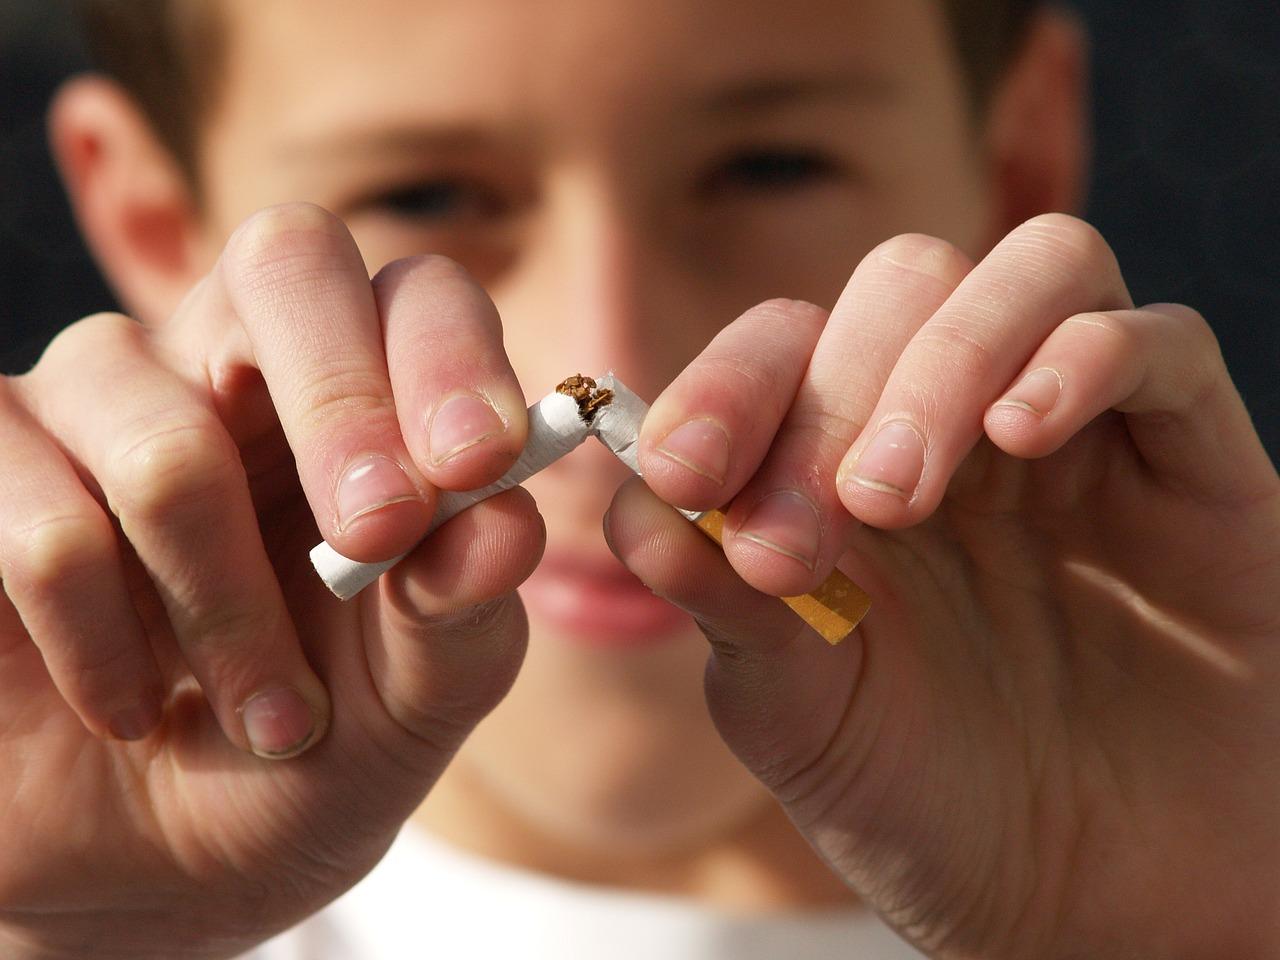 курение сигарета пиксабай